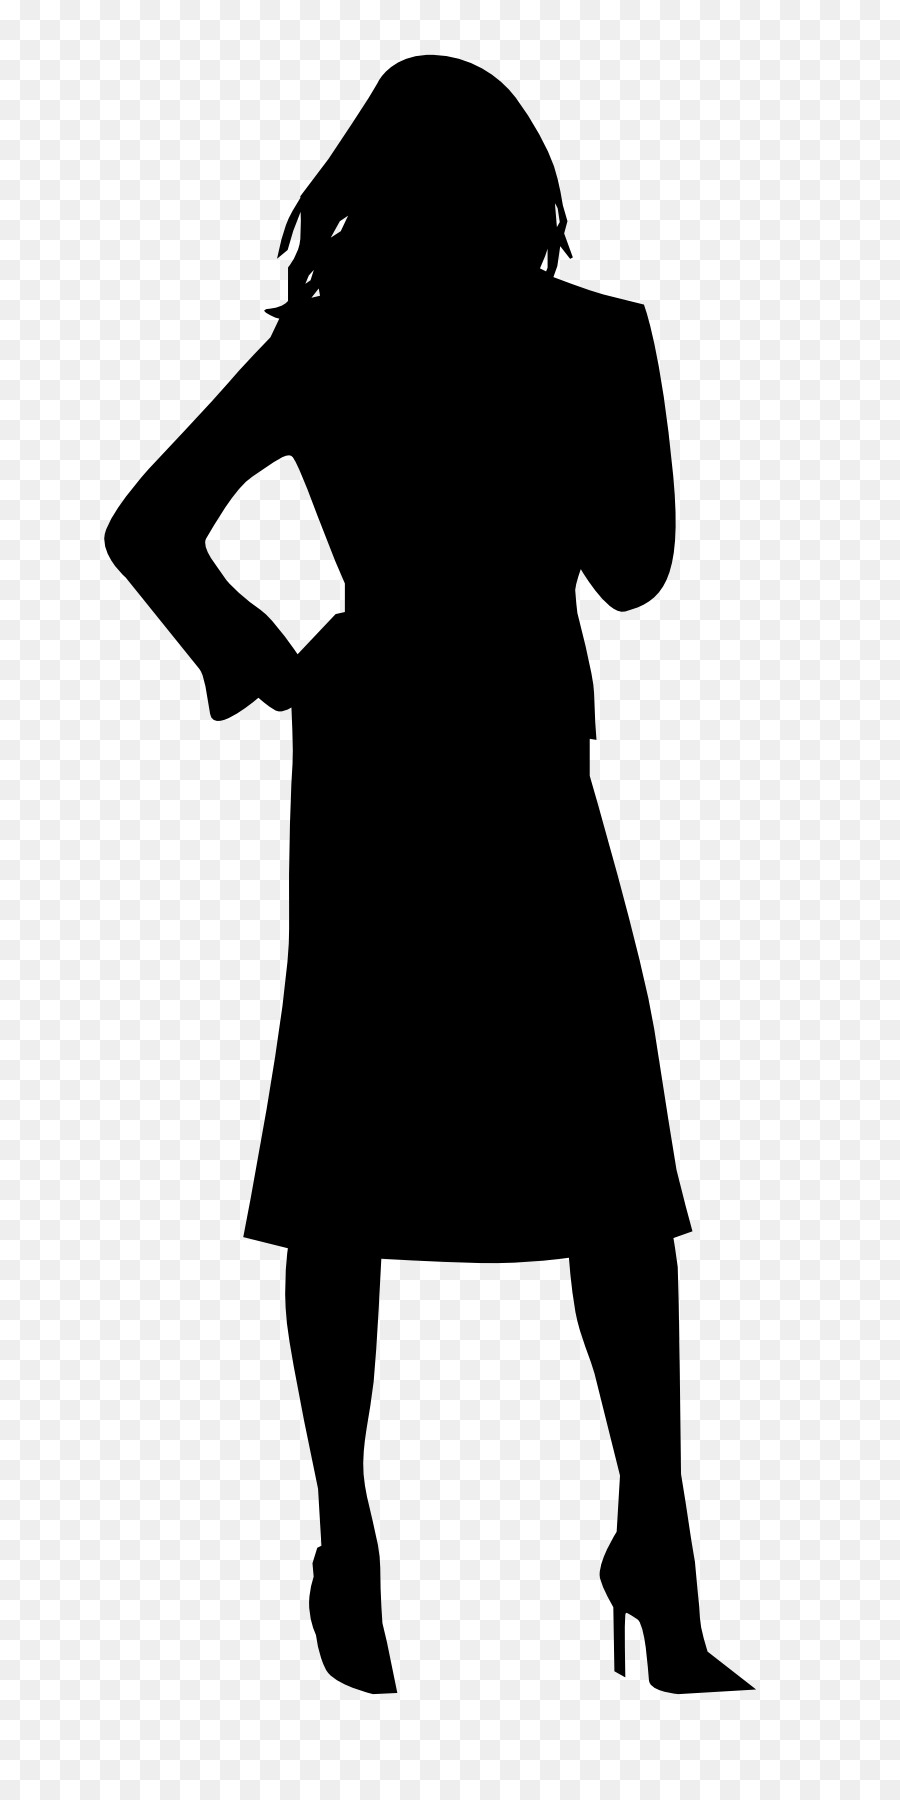 900x1800 Woman Silhouette Clip Art